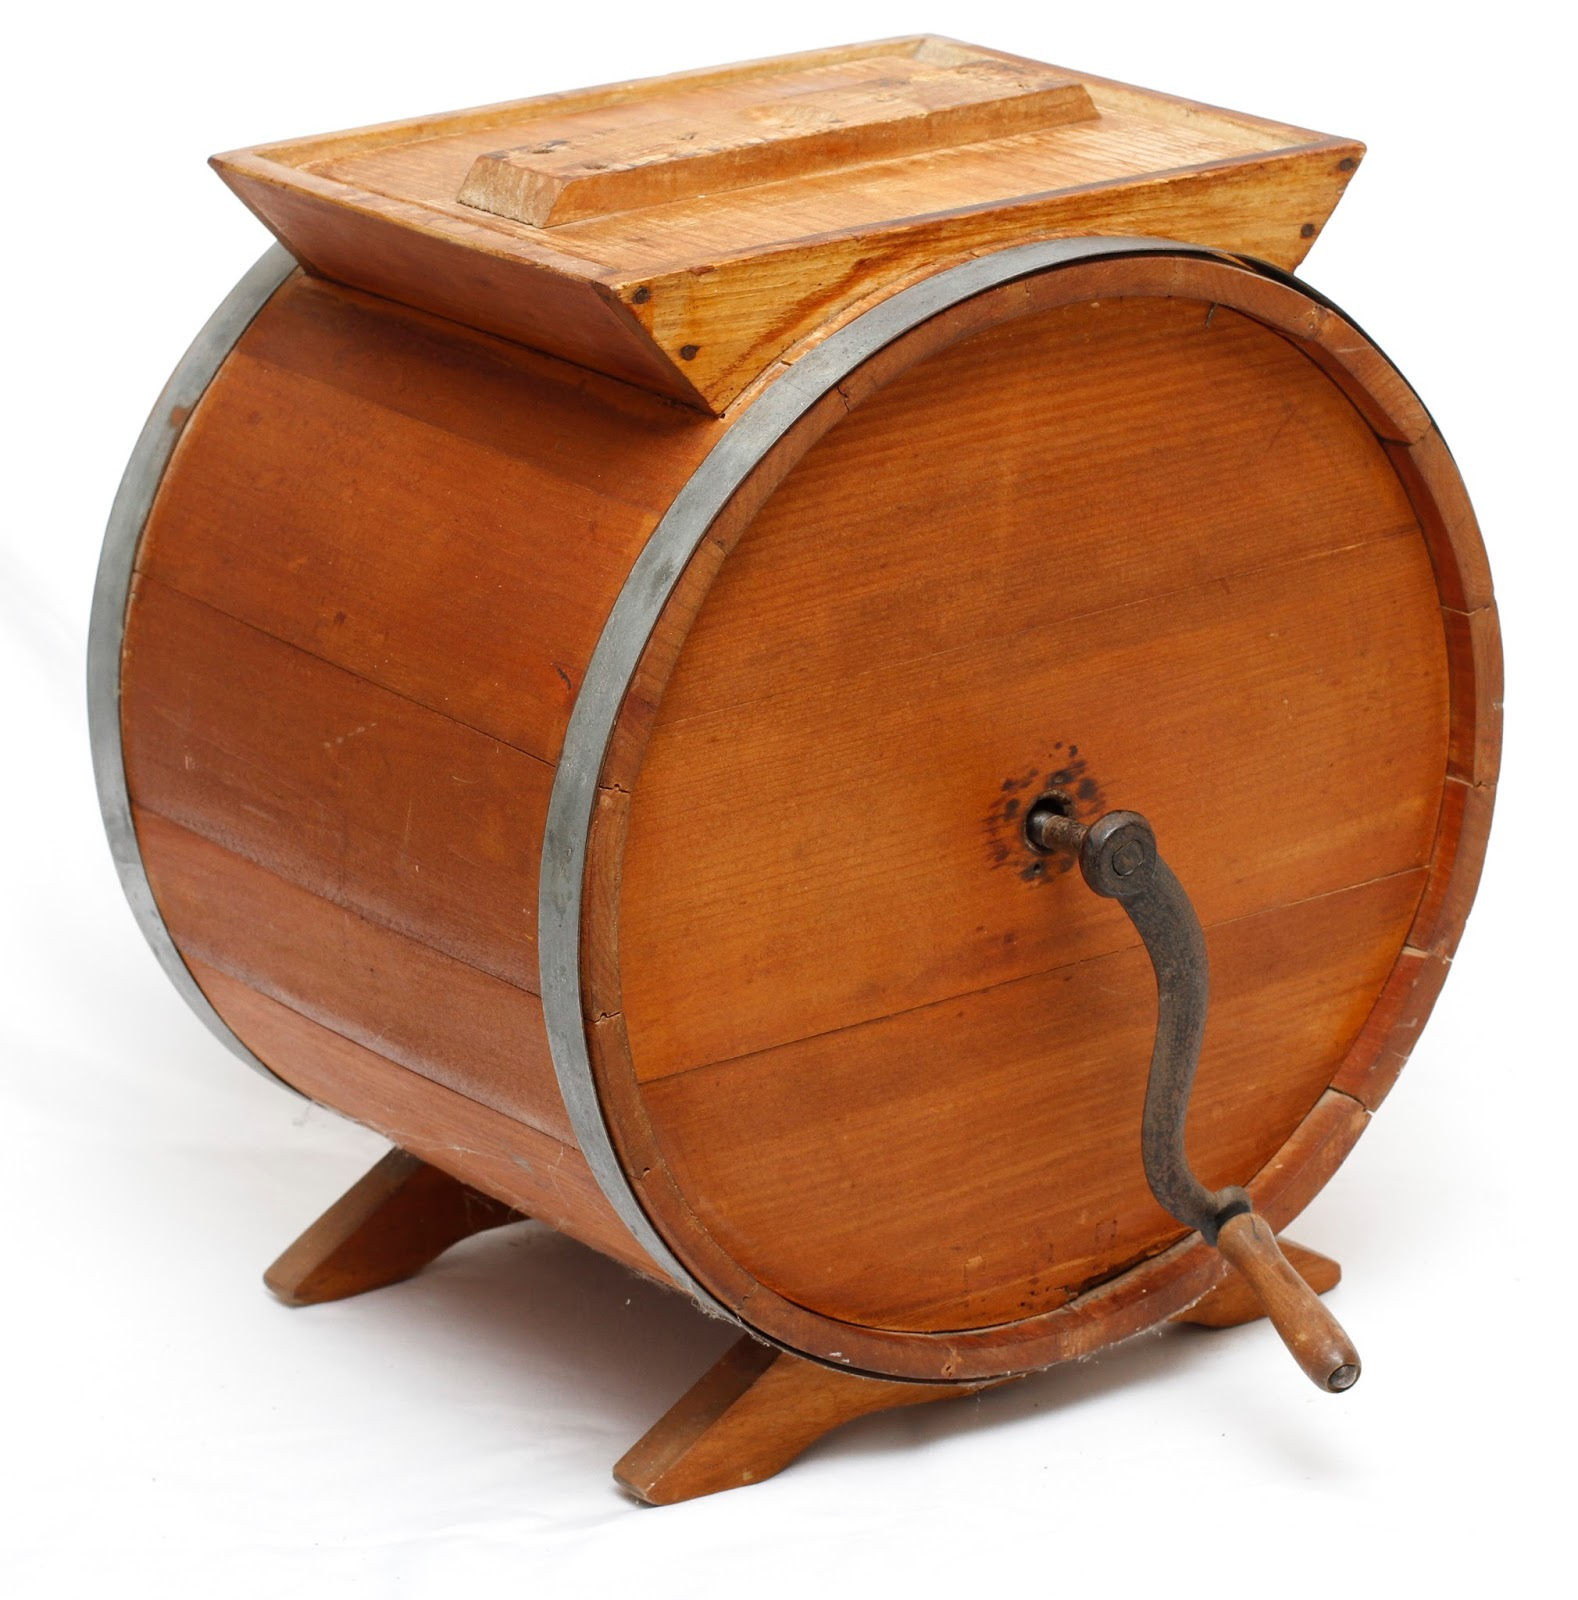 Antique Wooden Butter Churn   Grandmas Attic Auction